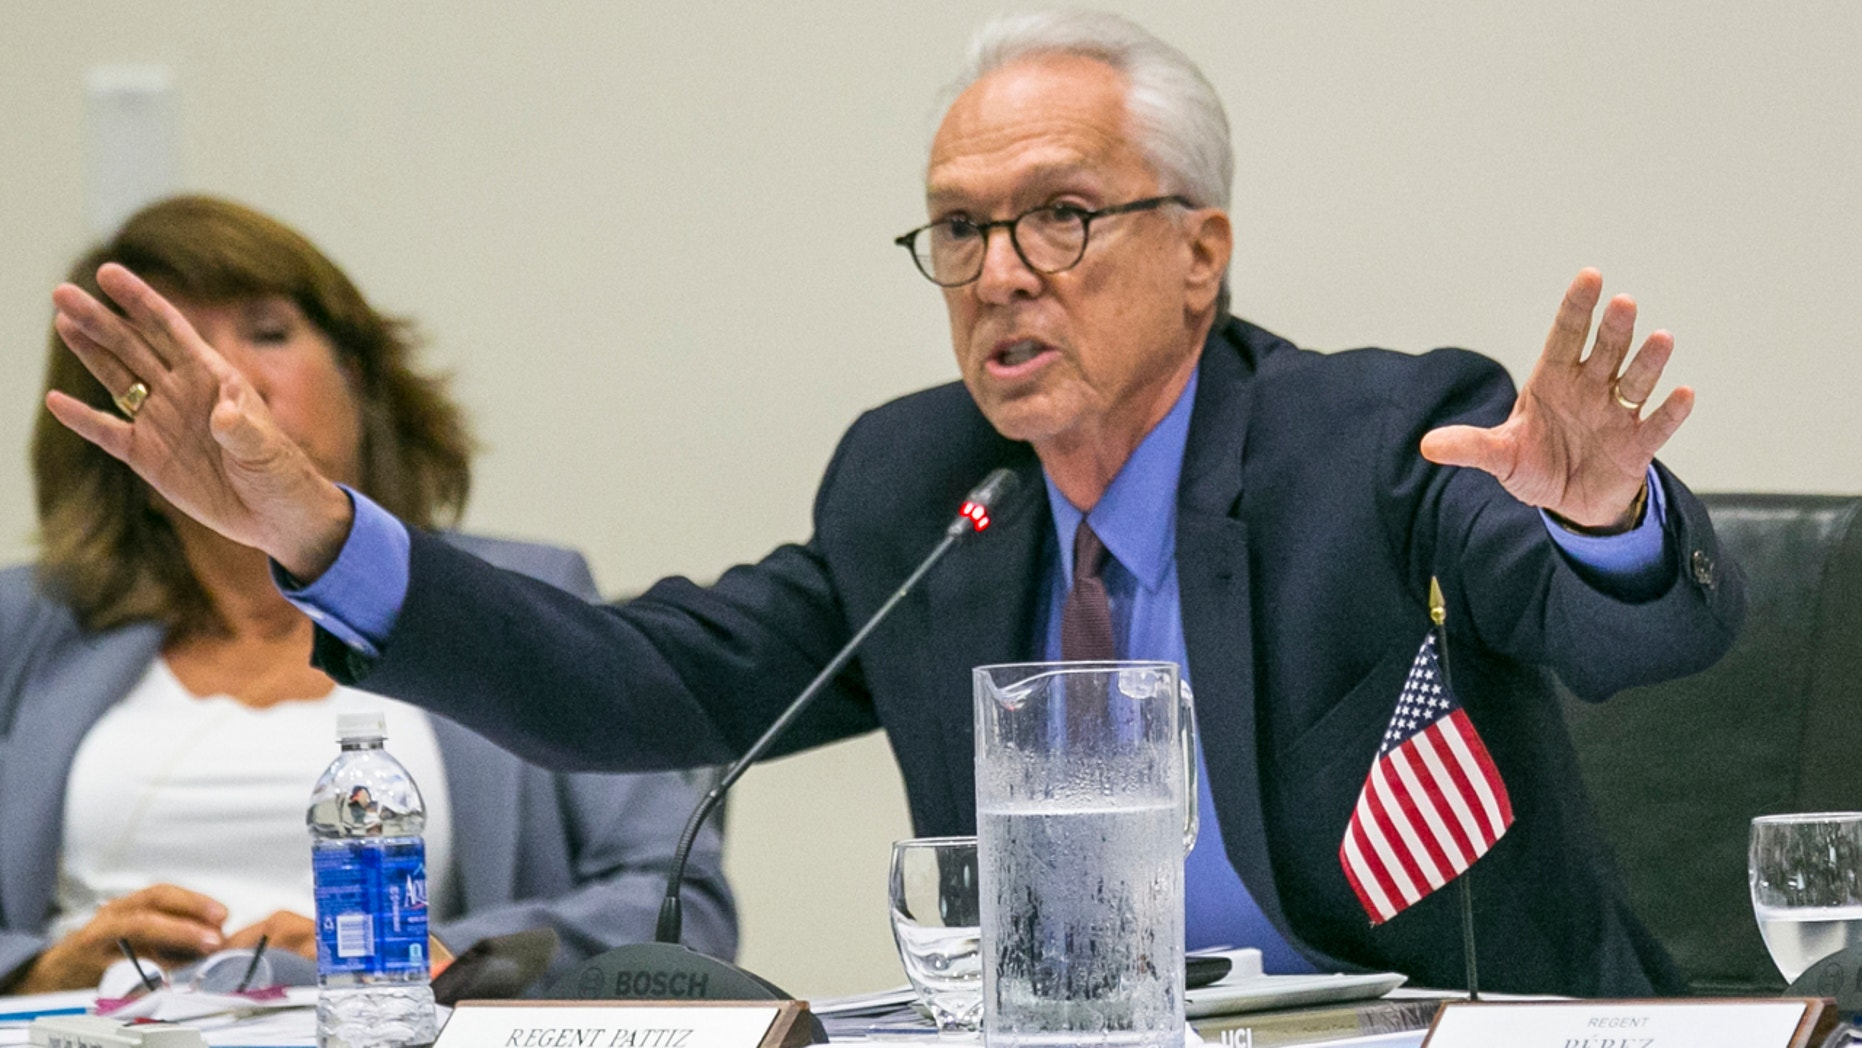 University of California Regent Norman Pattiz, right, addresses fellow board members in Irvine, Calif., Sept. 17, 2015.